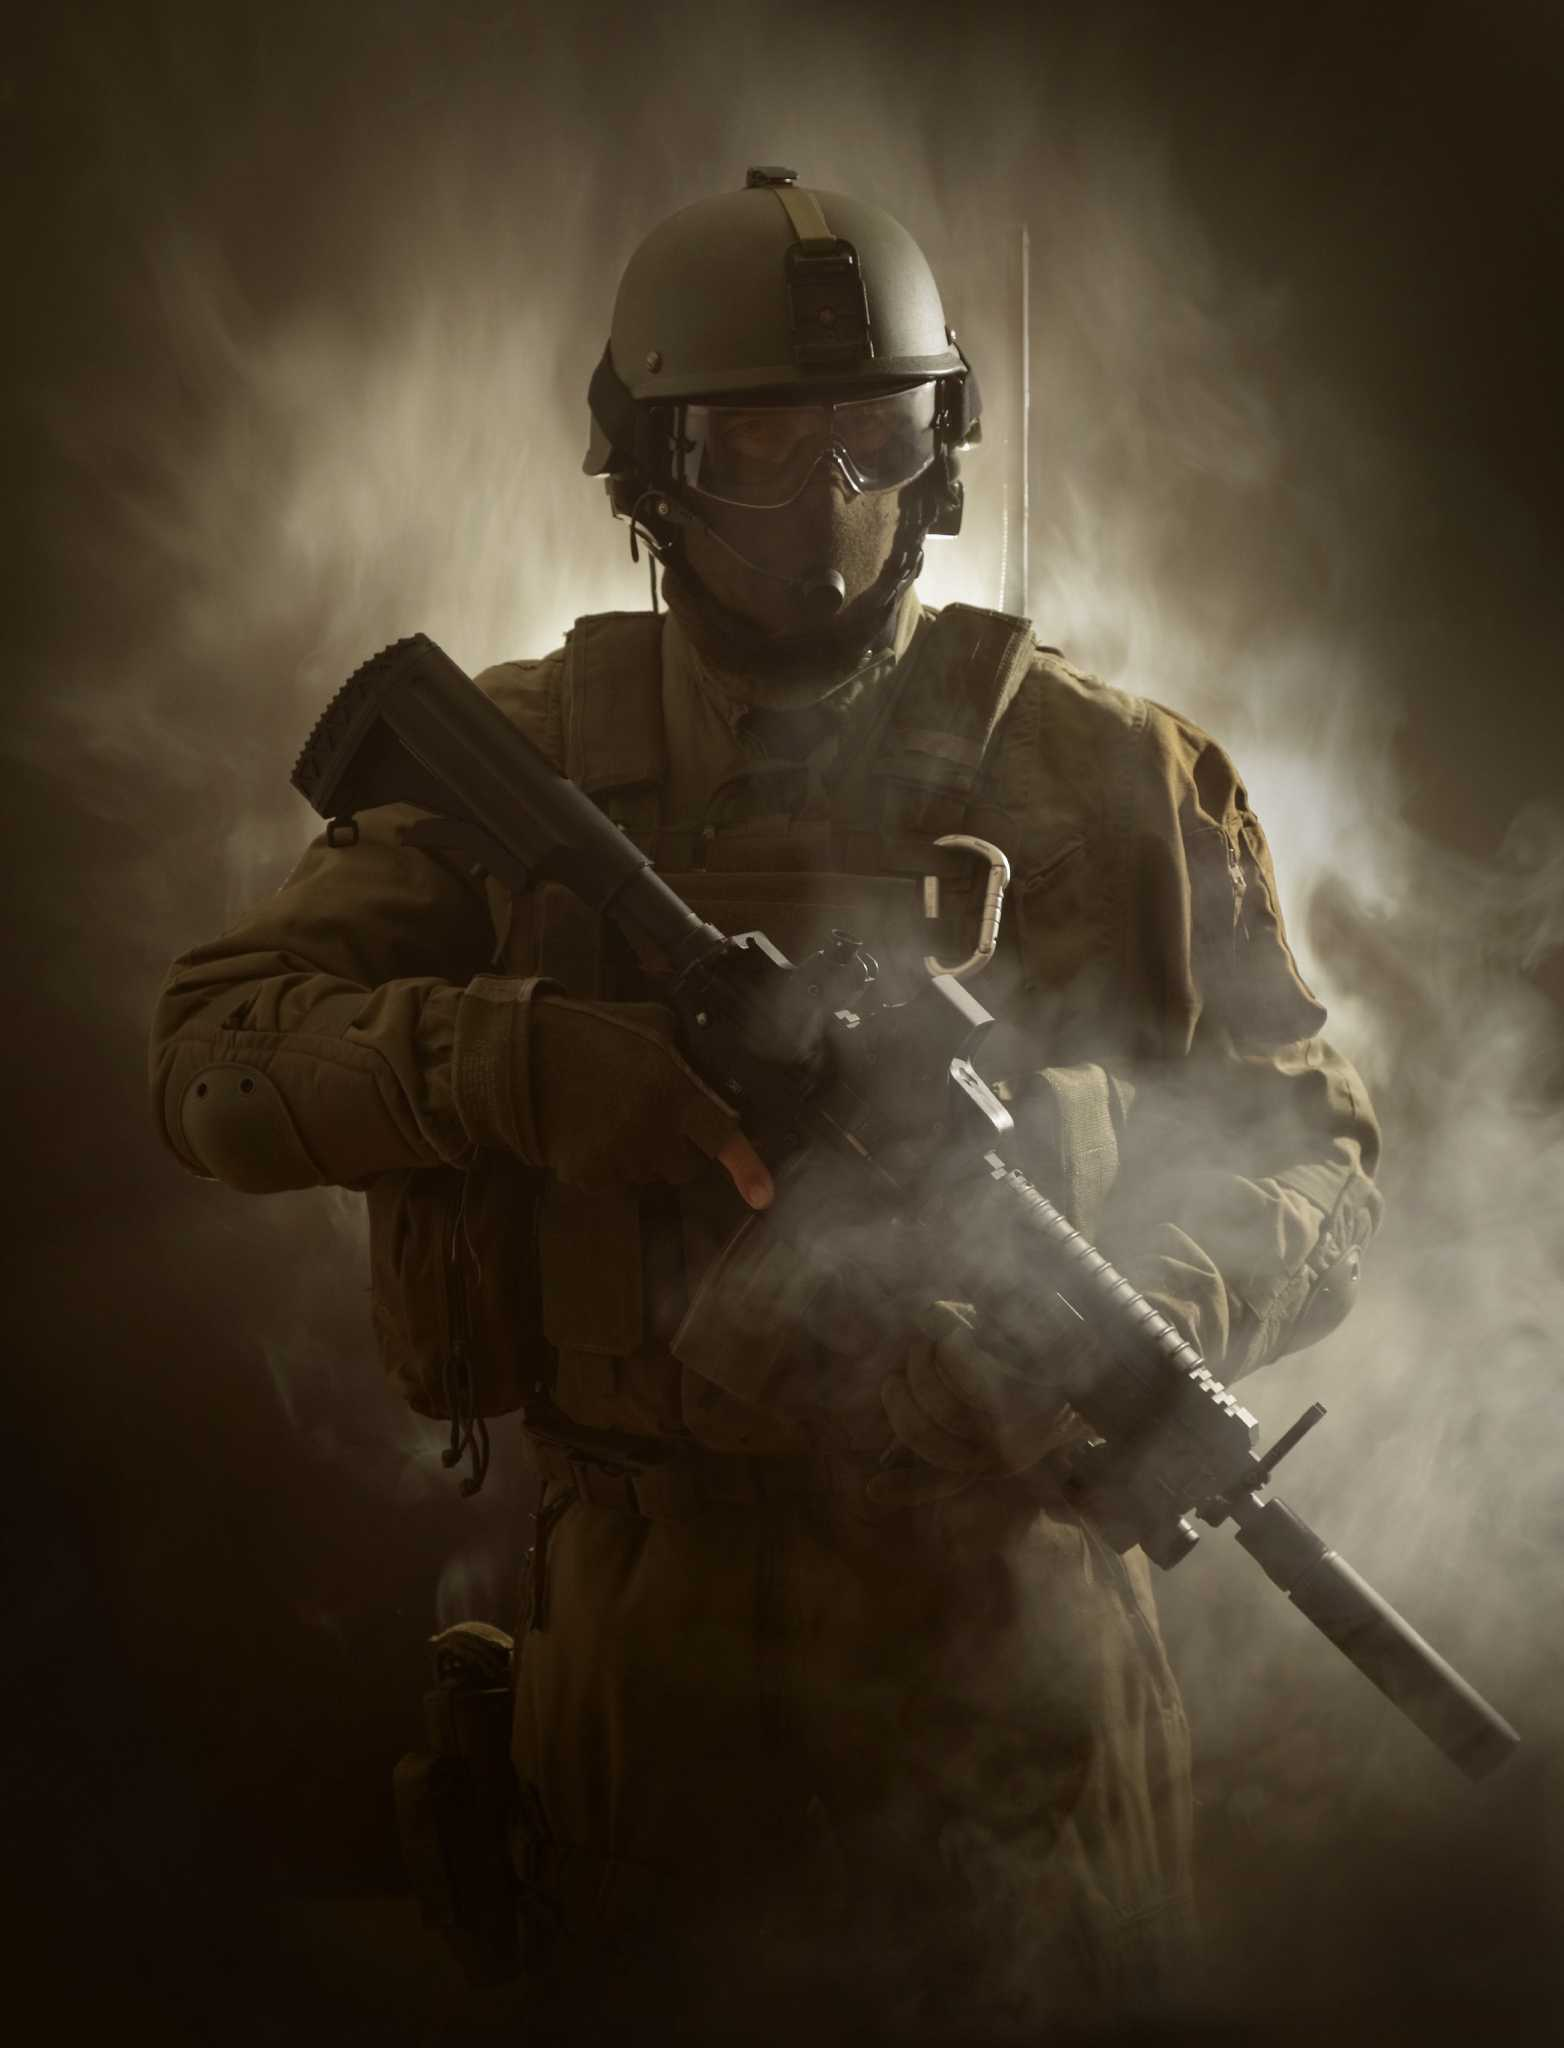 8c877ff8e6a37 The secret history of SEAL Team 6 - San Antonio Express-News